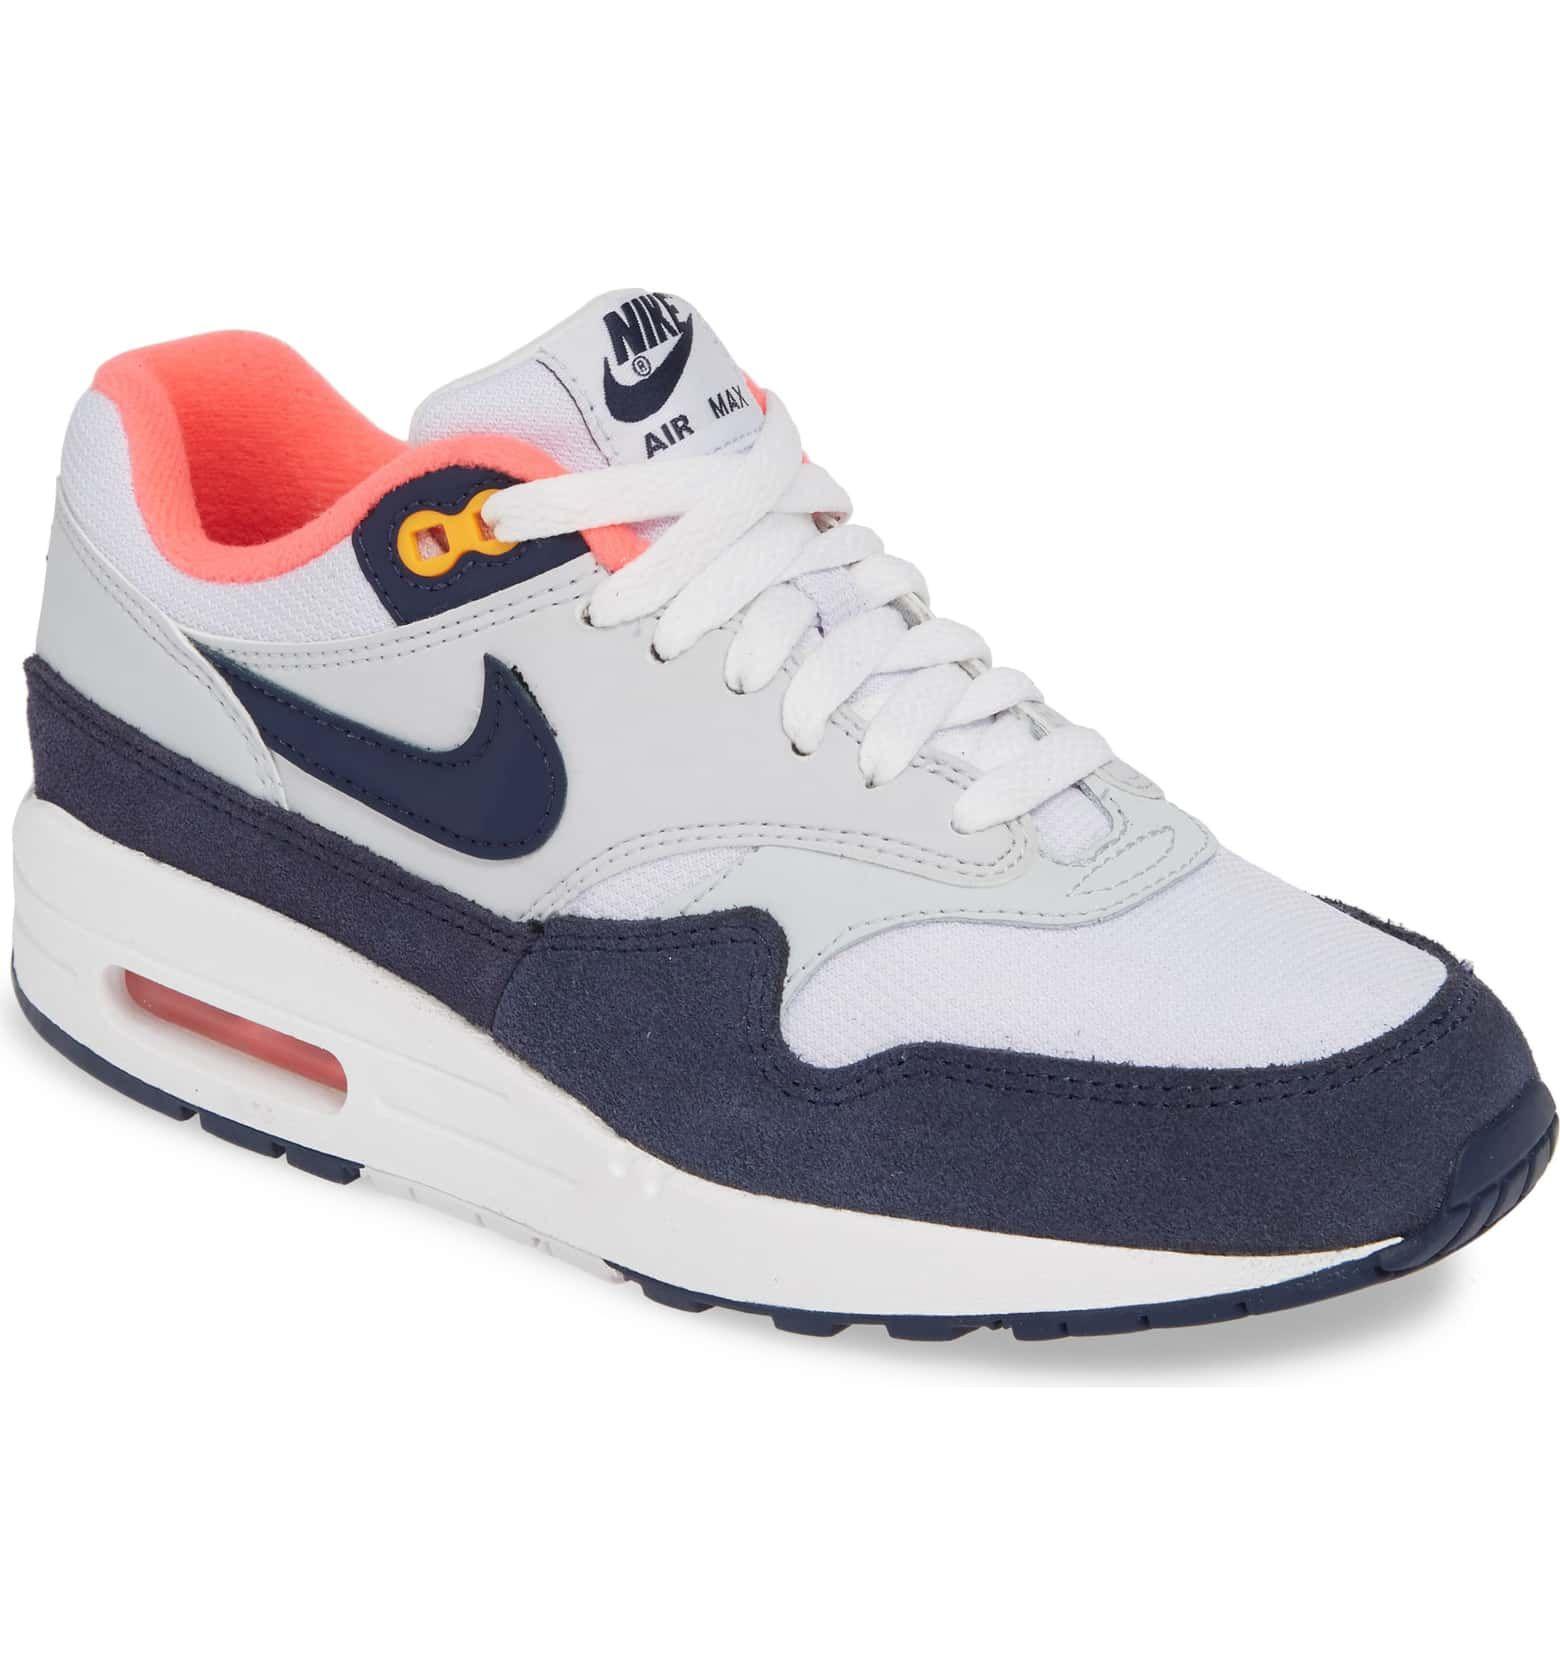 Nike Air Max 1 ND Sneaker (Women